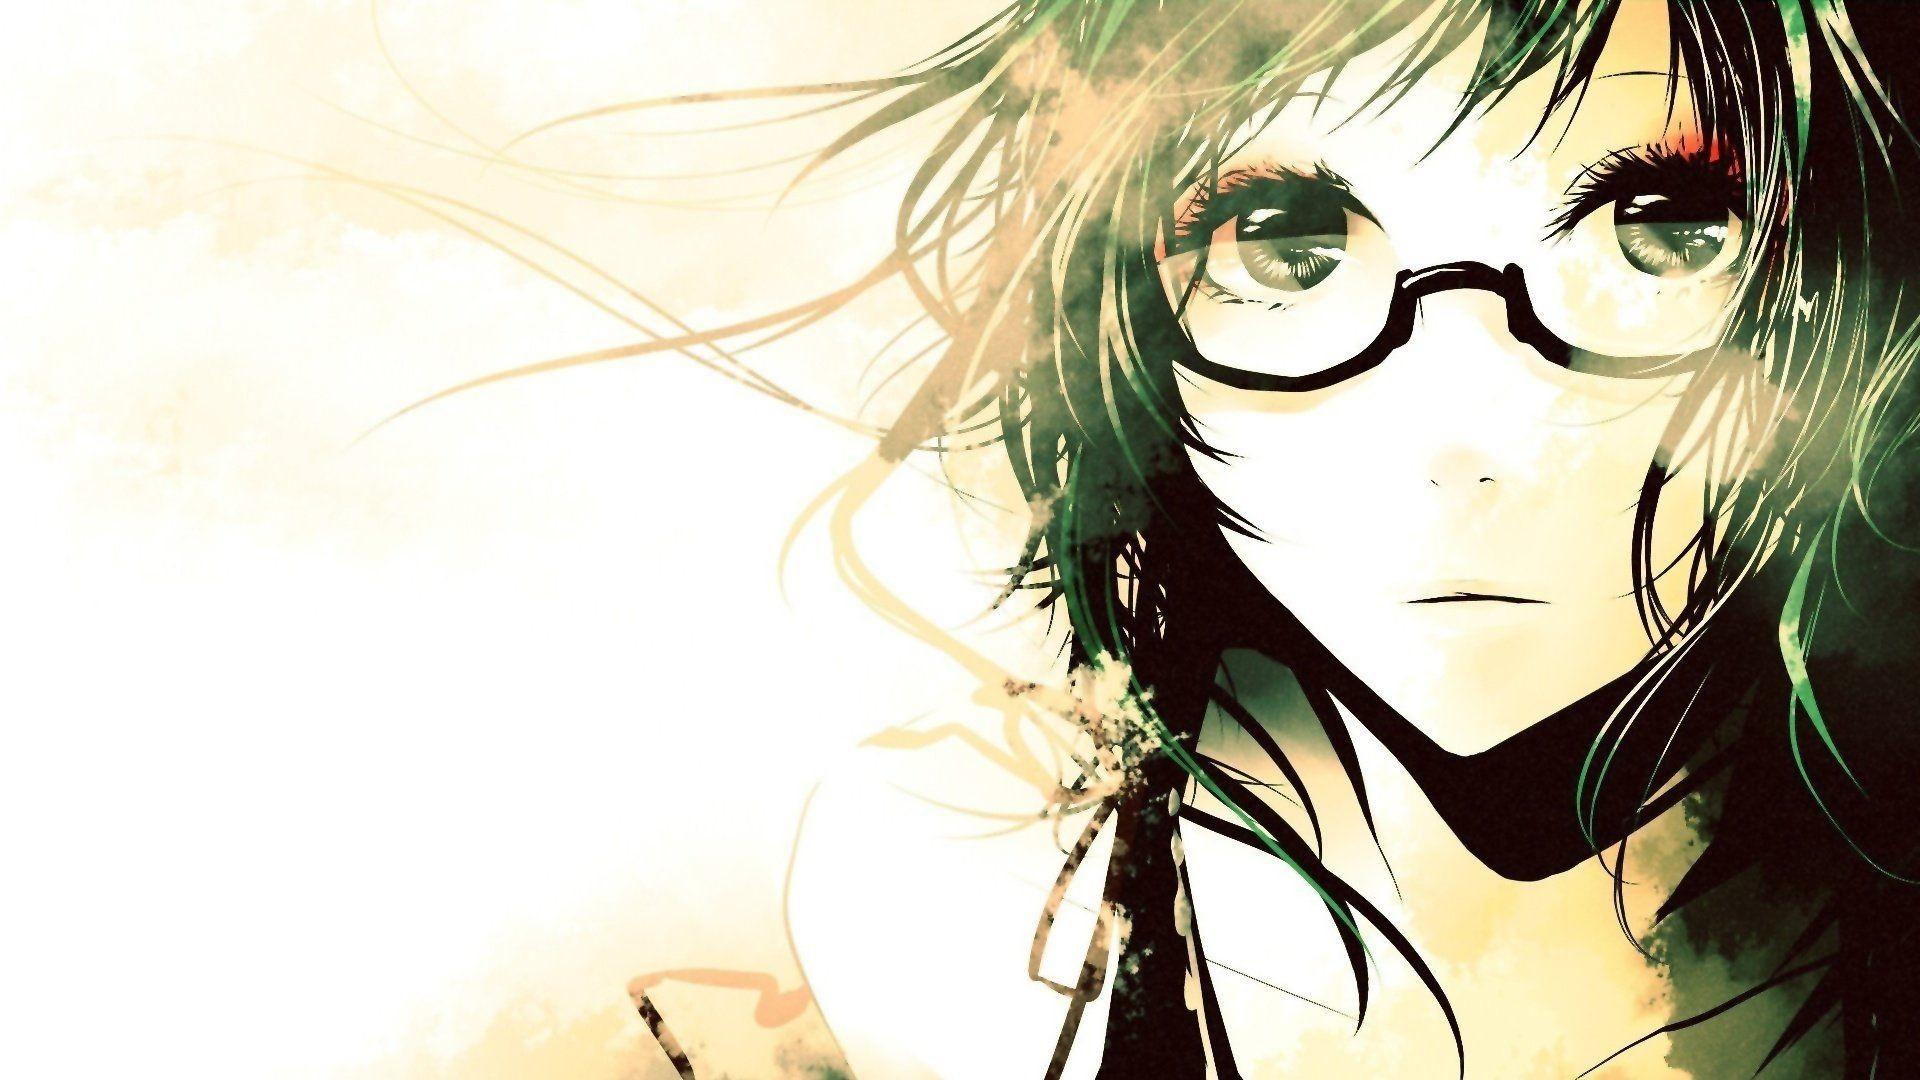 Anime desktop wallpapers hd – Animes Music 885351 Animes Desktop. Download